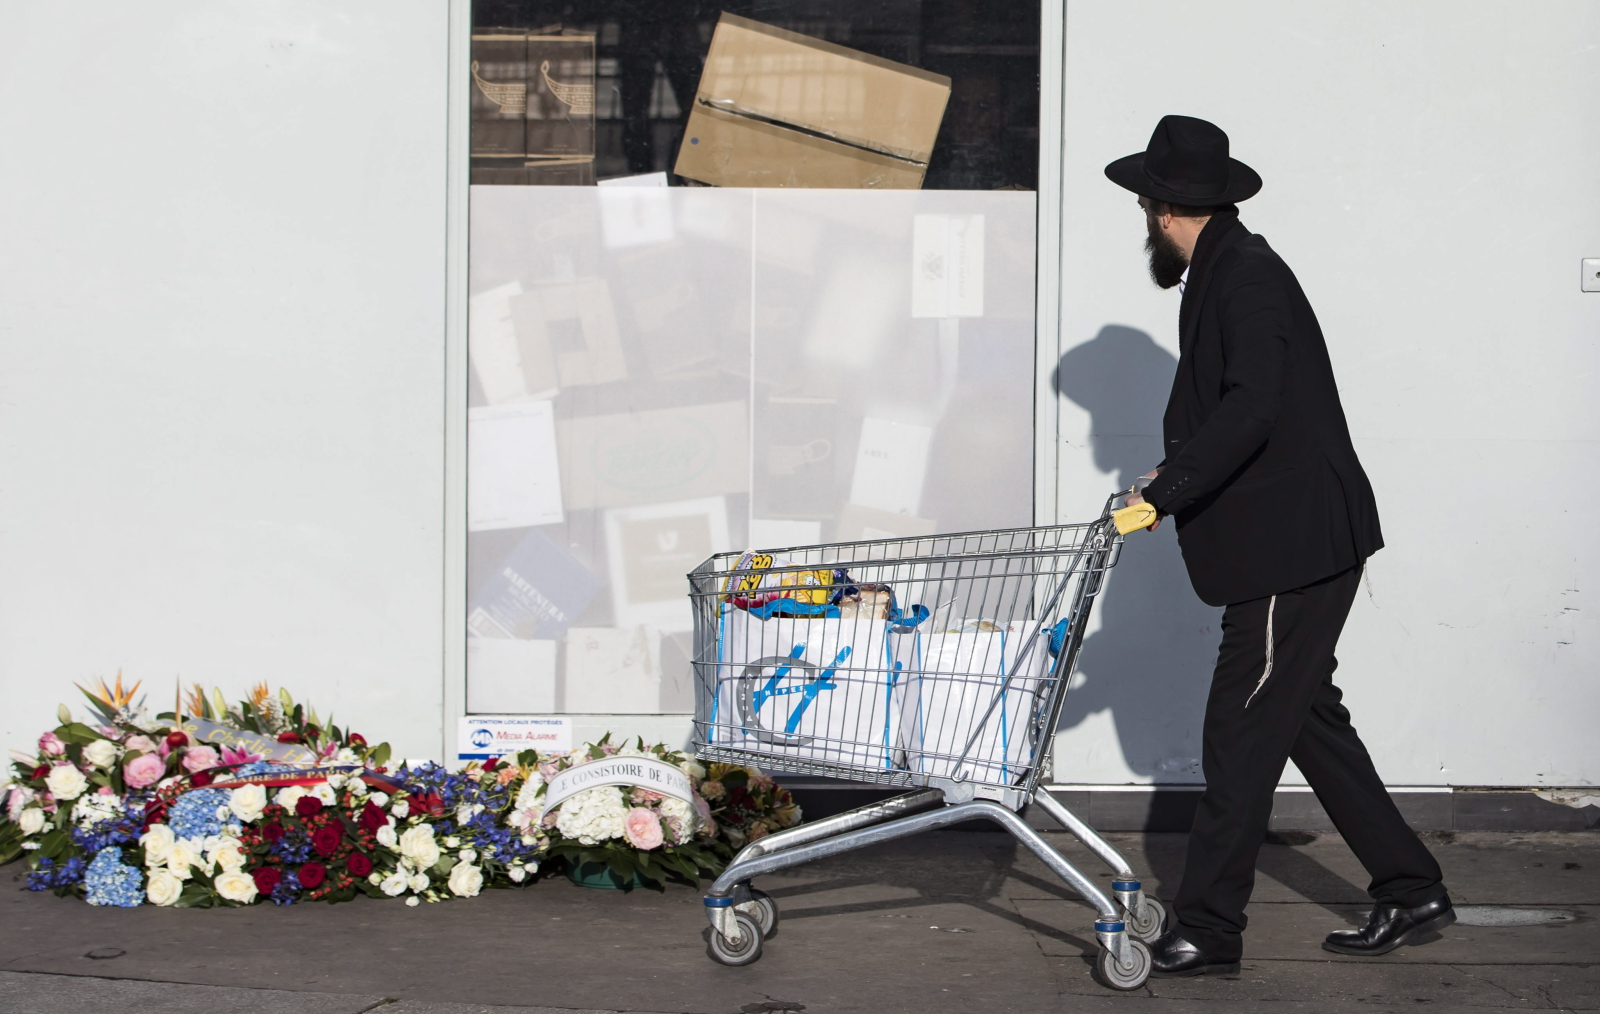 Druga rocznica ataku na redakcję Charlie Hebdo we Francji.  Fot. PAP/EPA/IAN LANGSDON